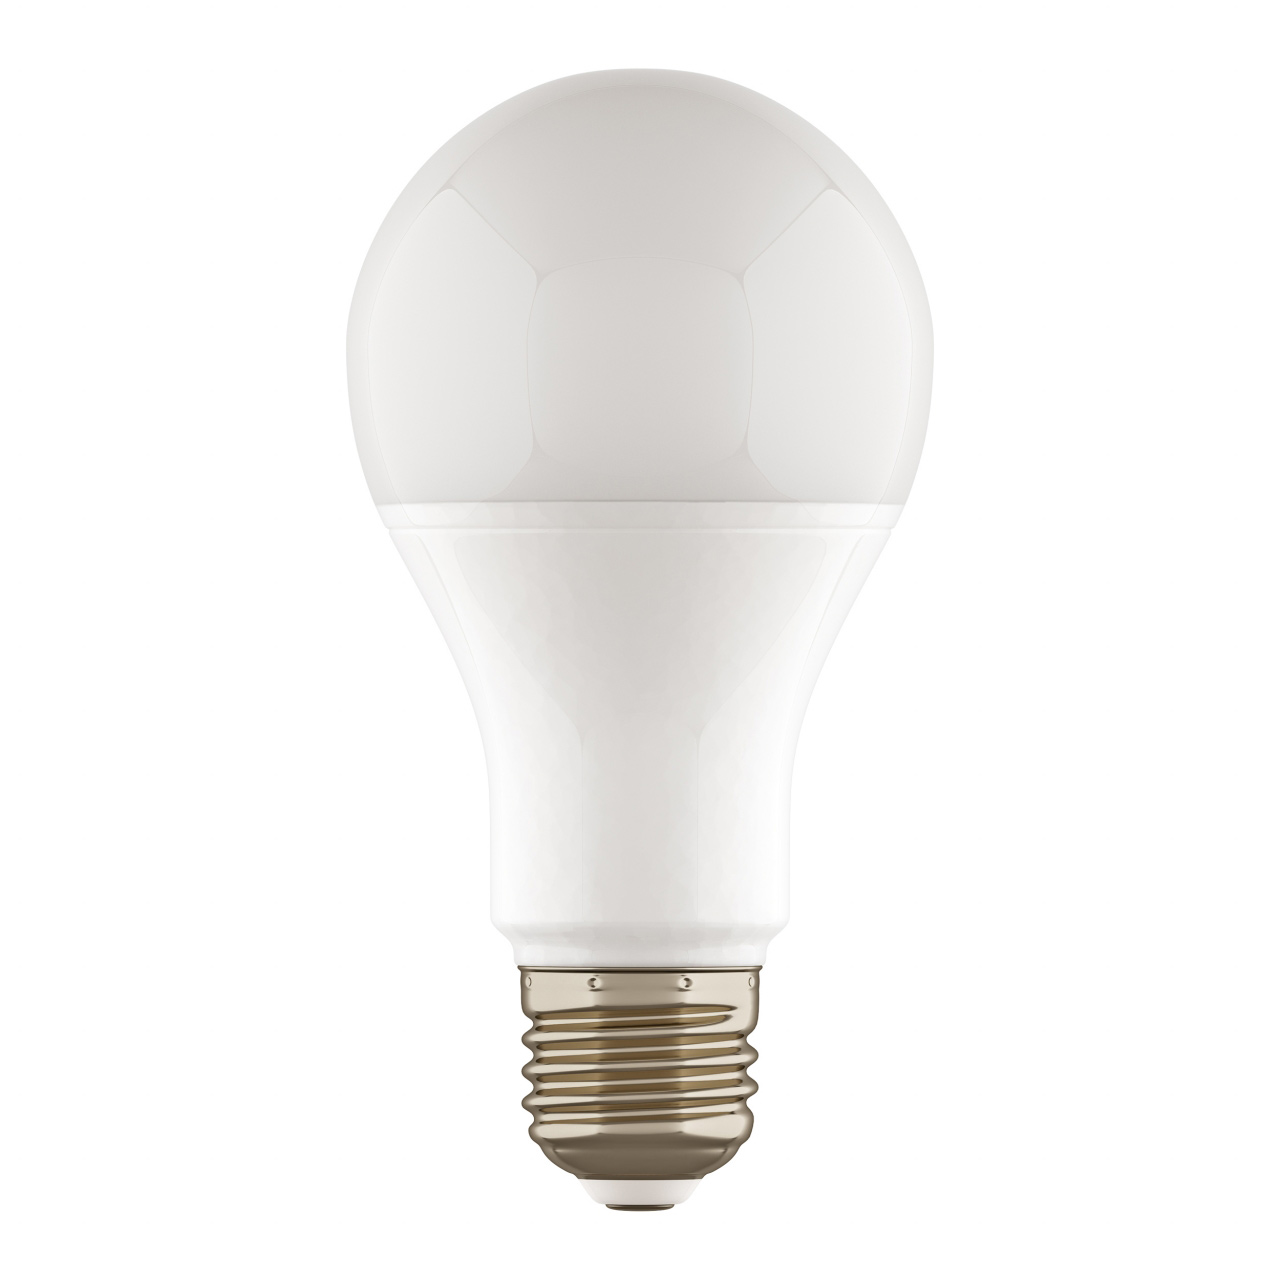 Лампа LED 220V A65 E27 12W=120W 950LM 180G FR 4000K 20000H Lightstar 930124